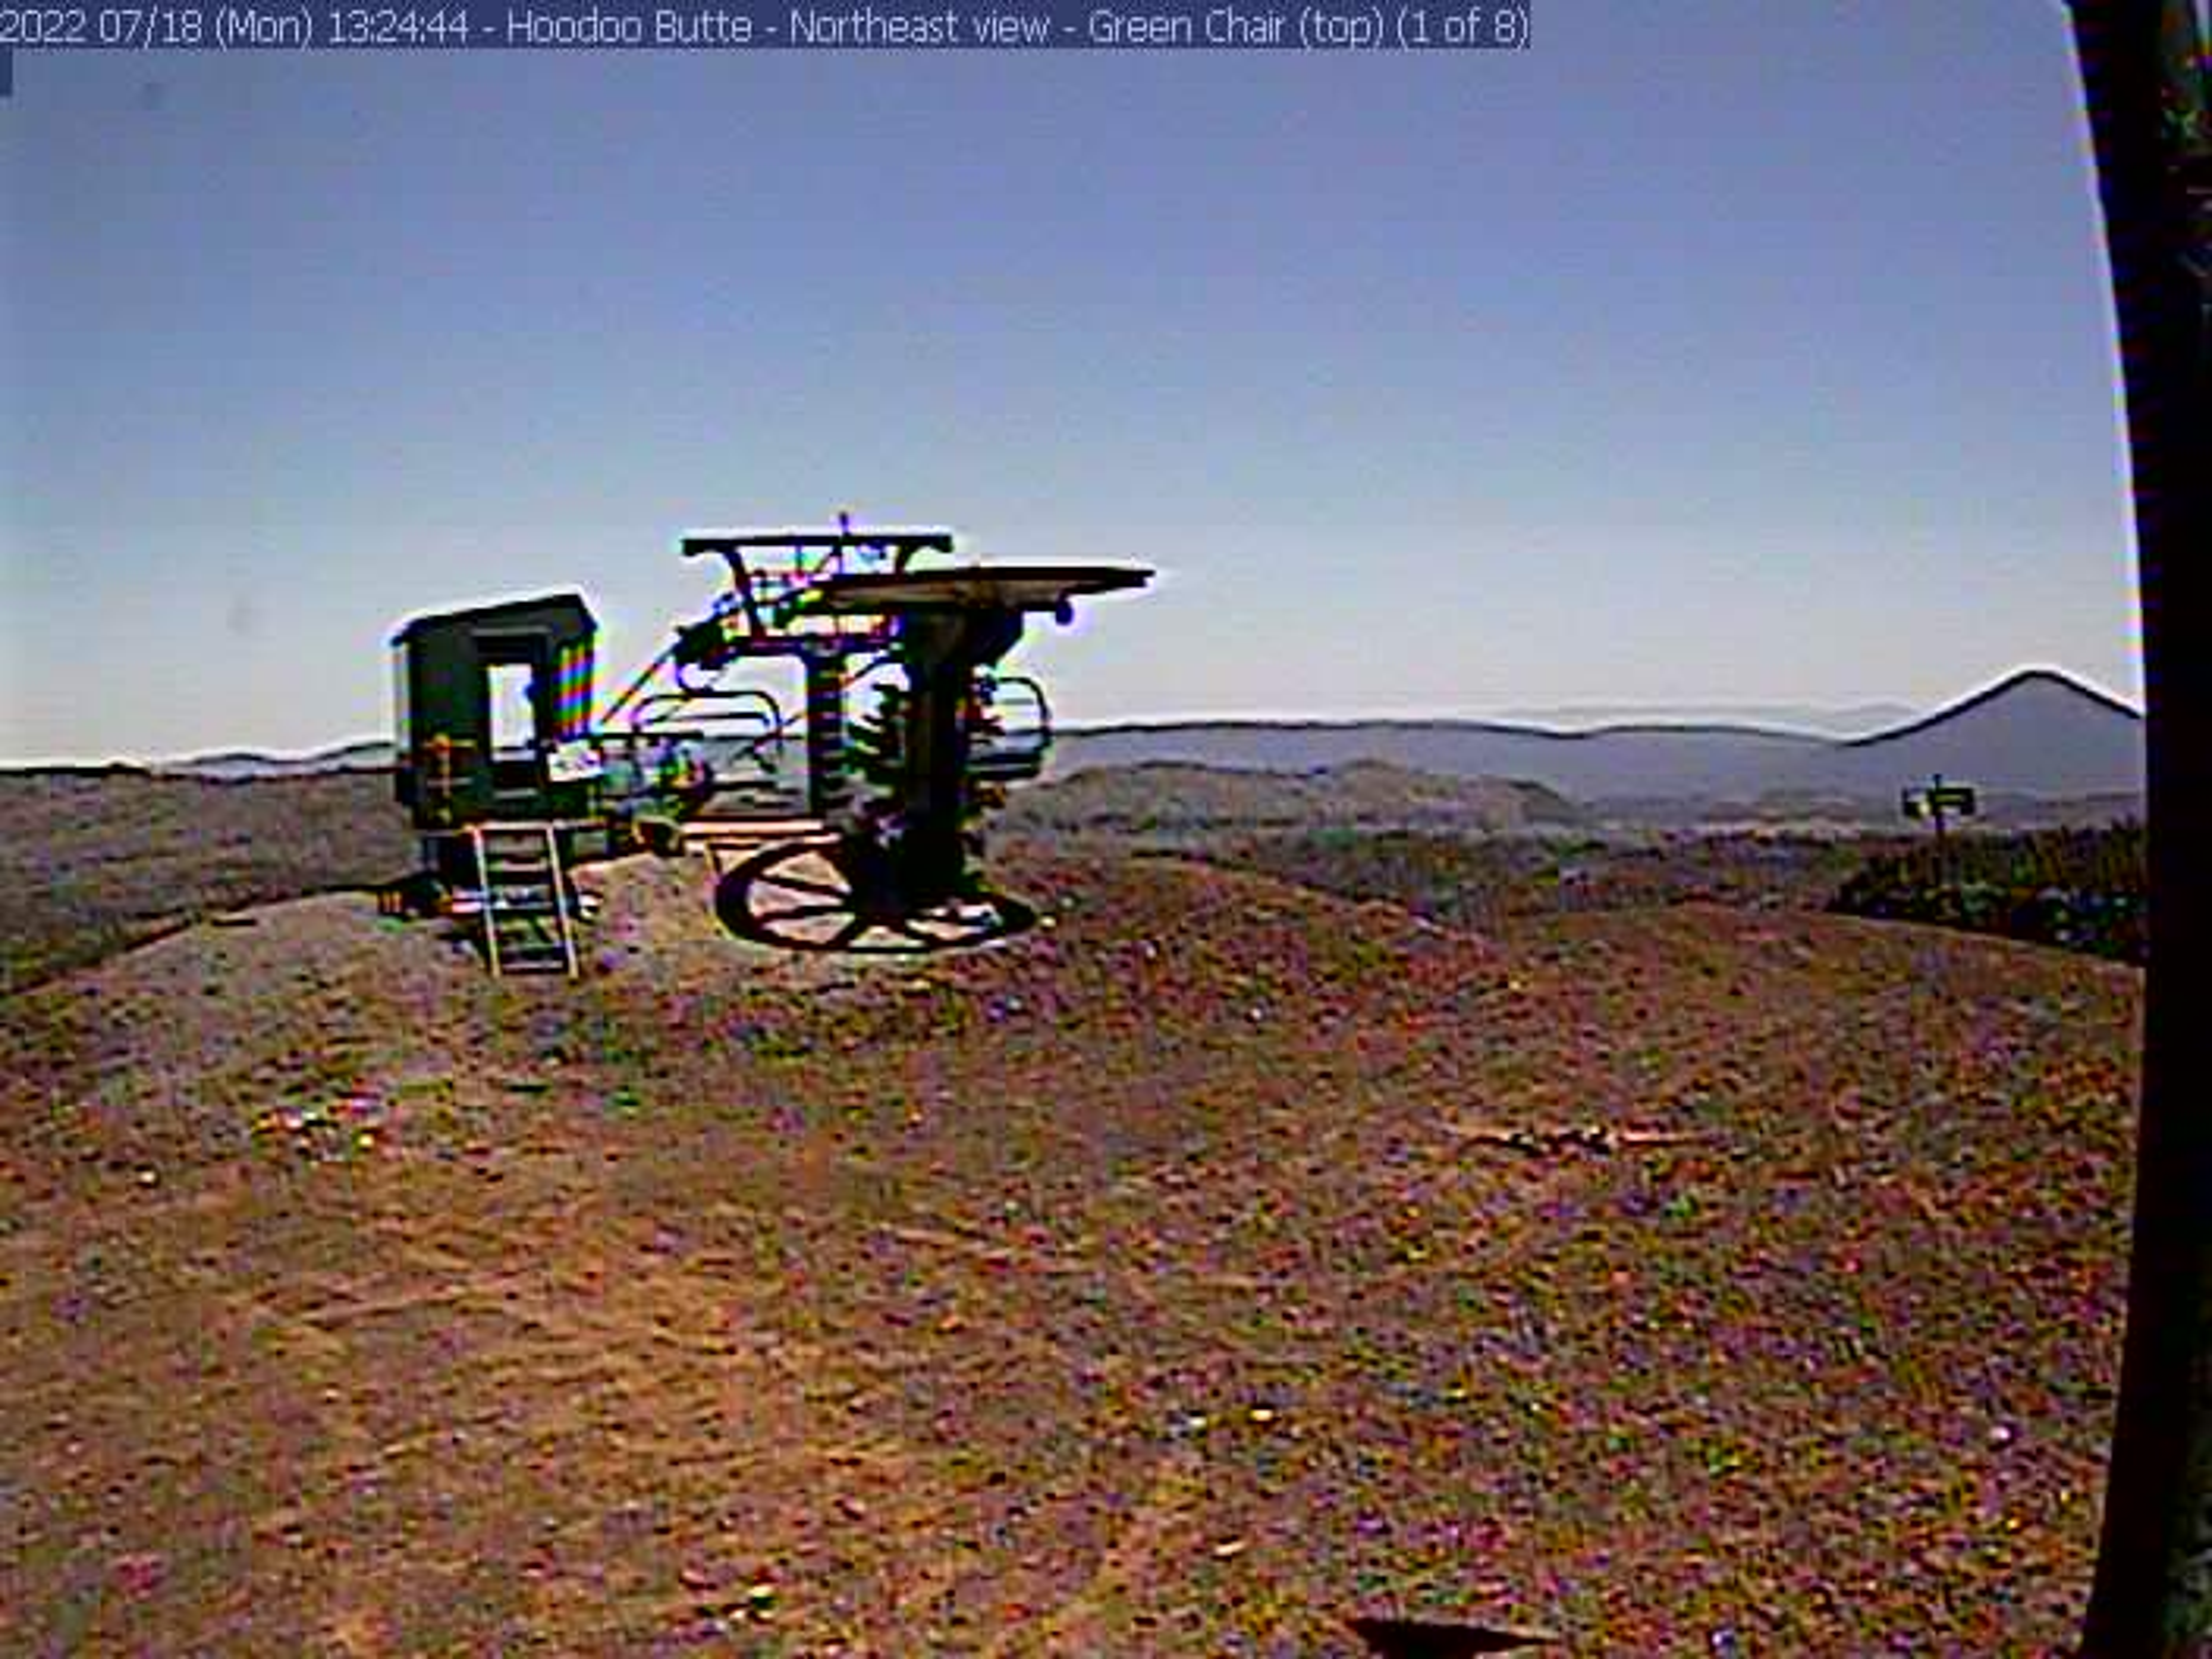 Hoodoo – Hoodoo Summit webcam image